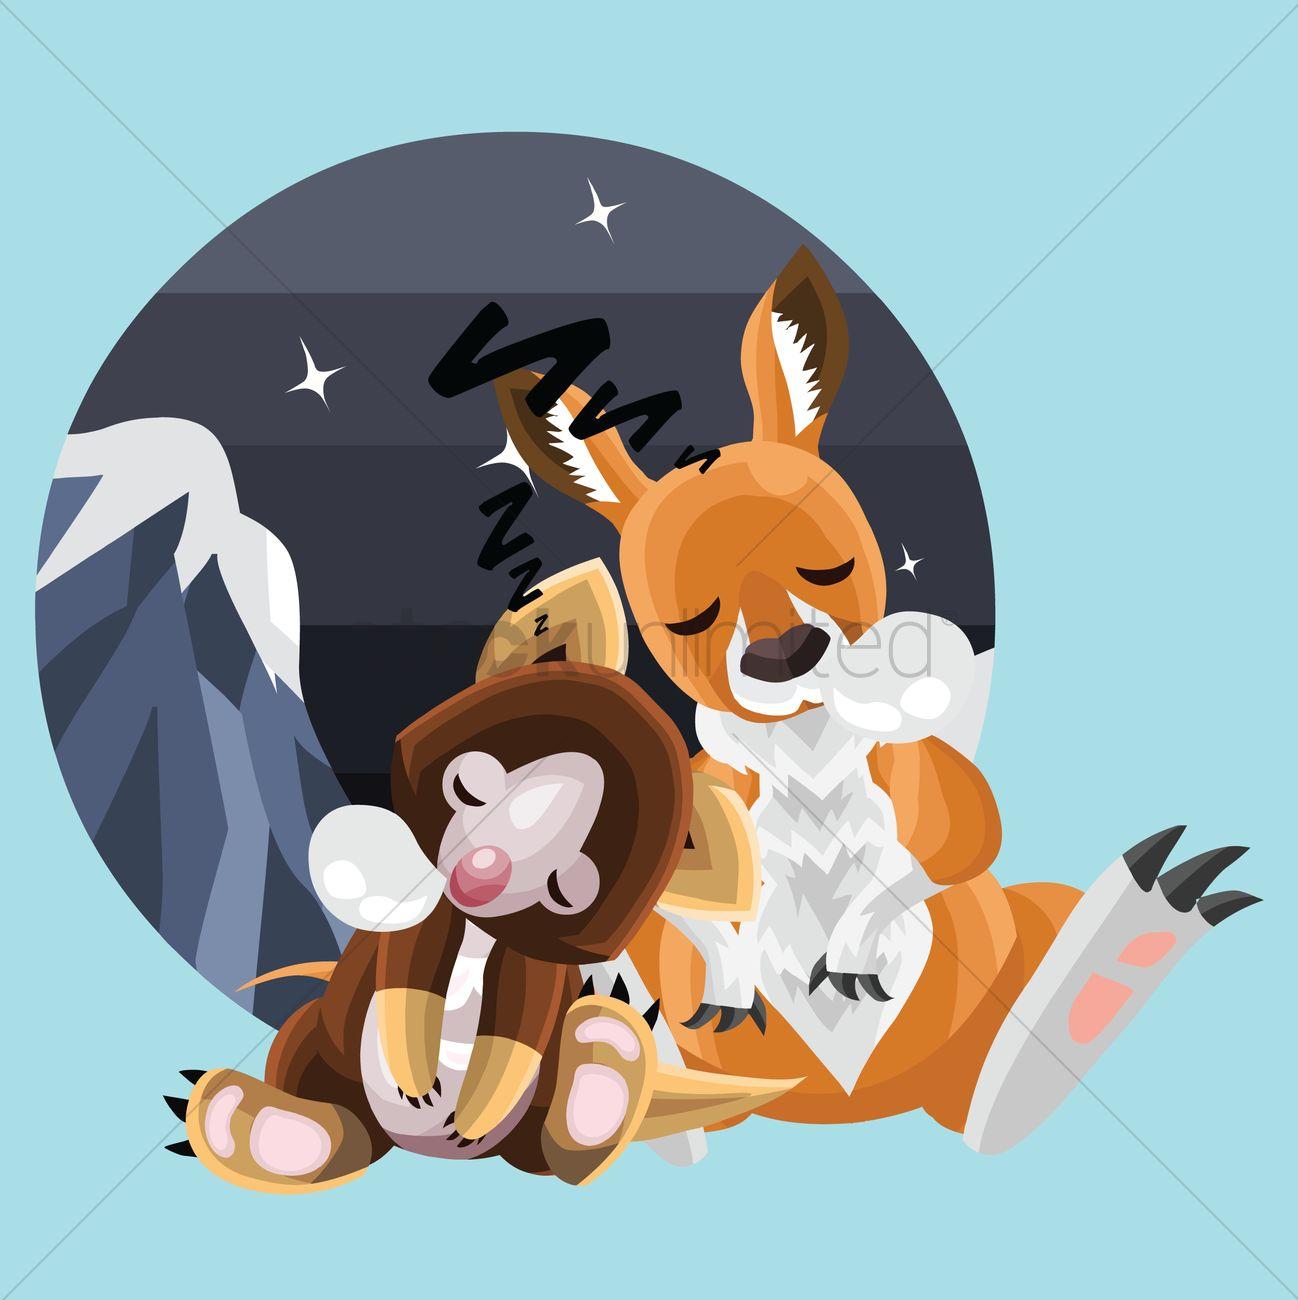 Animals sleeping together Vector Image.